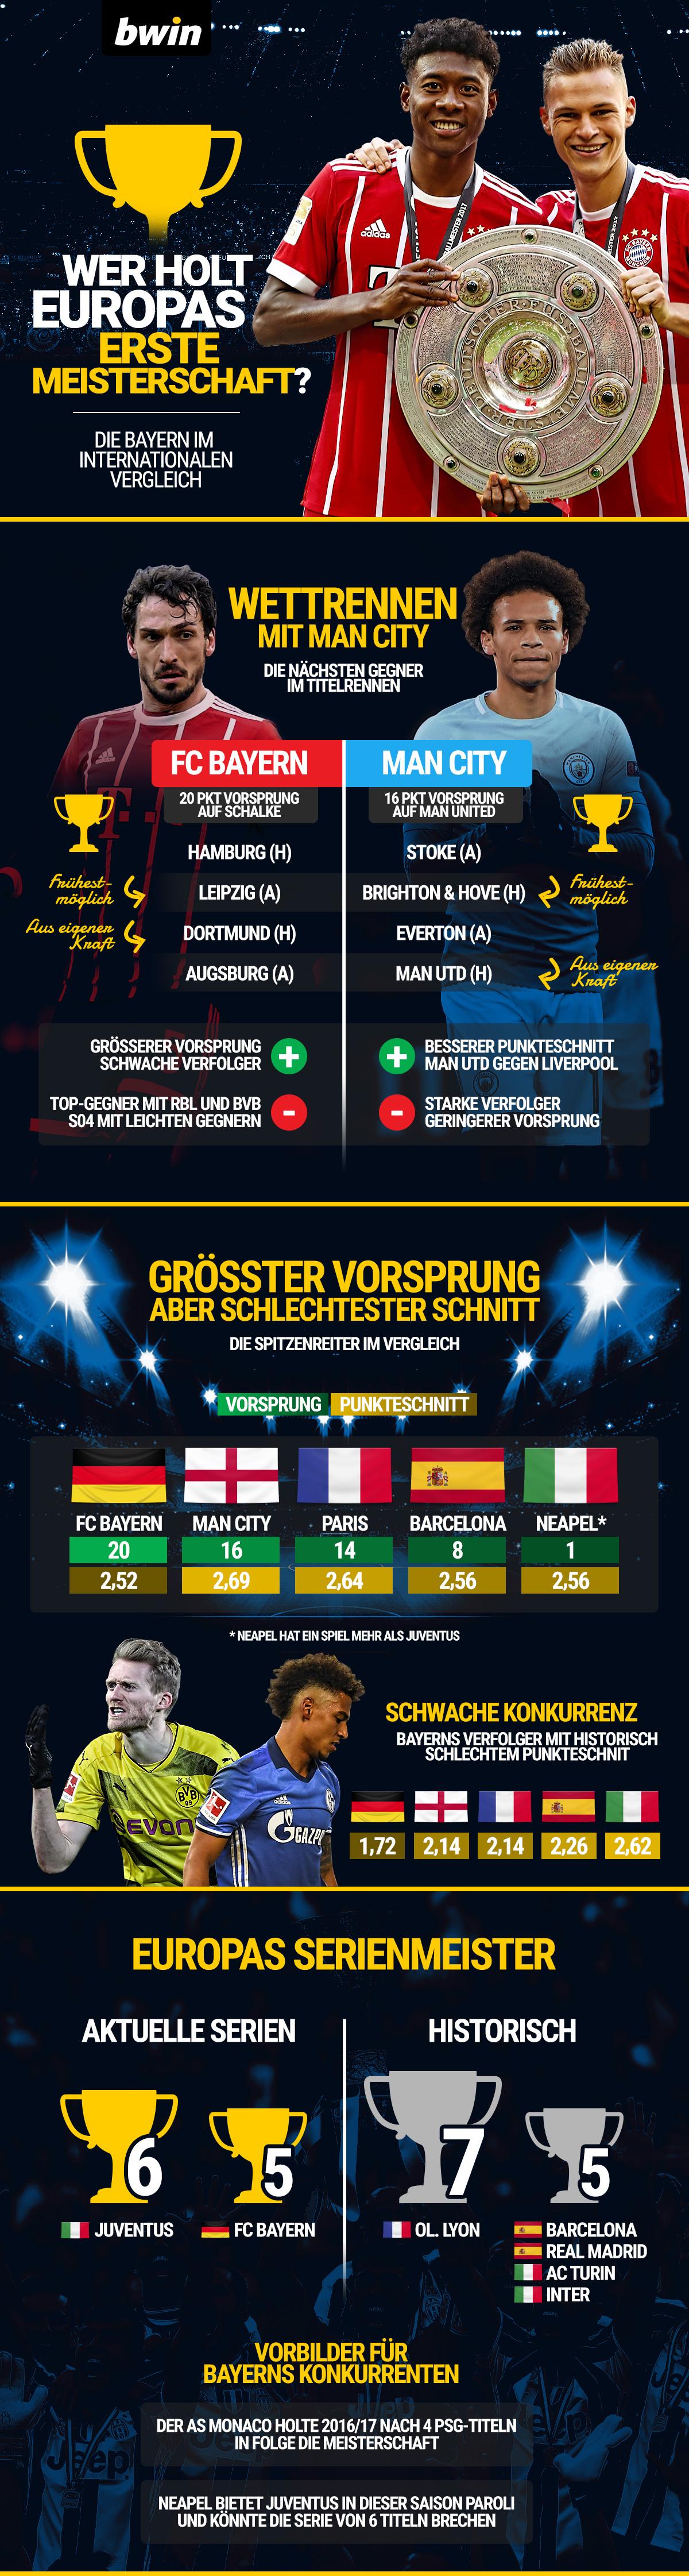 Bwin Europameister